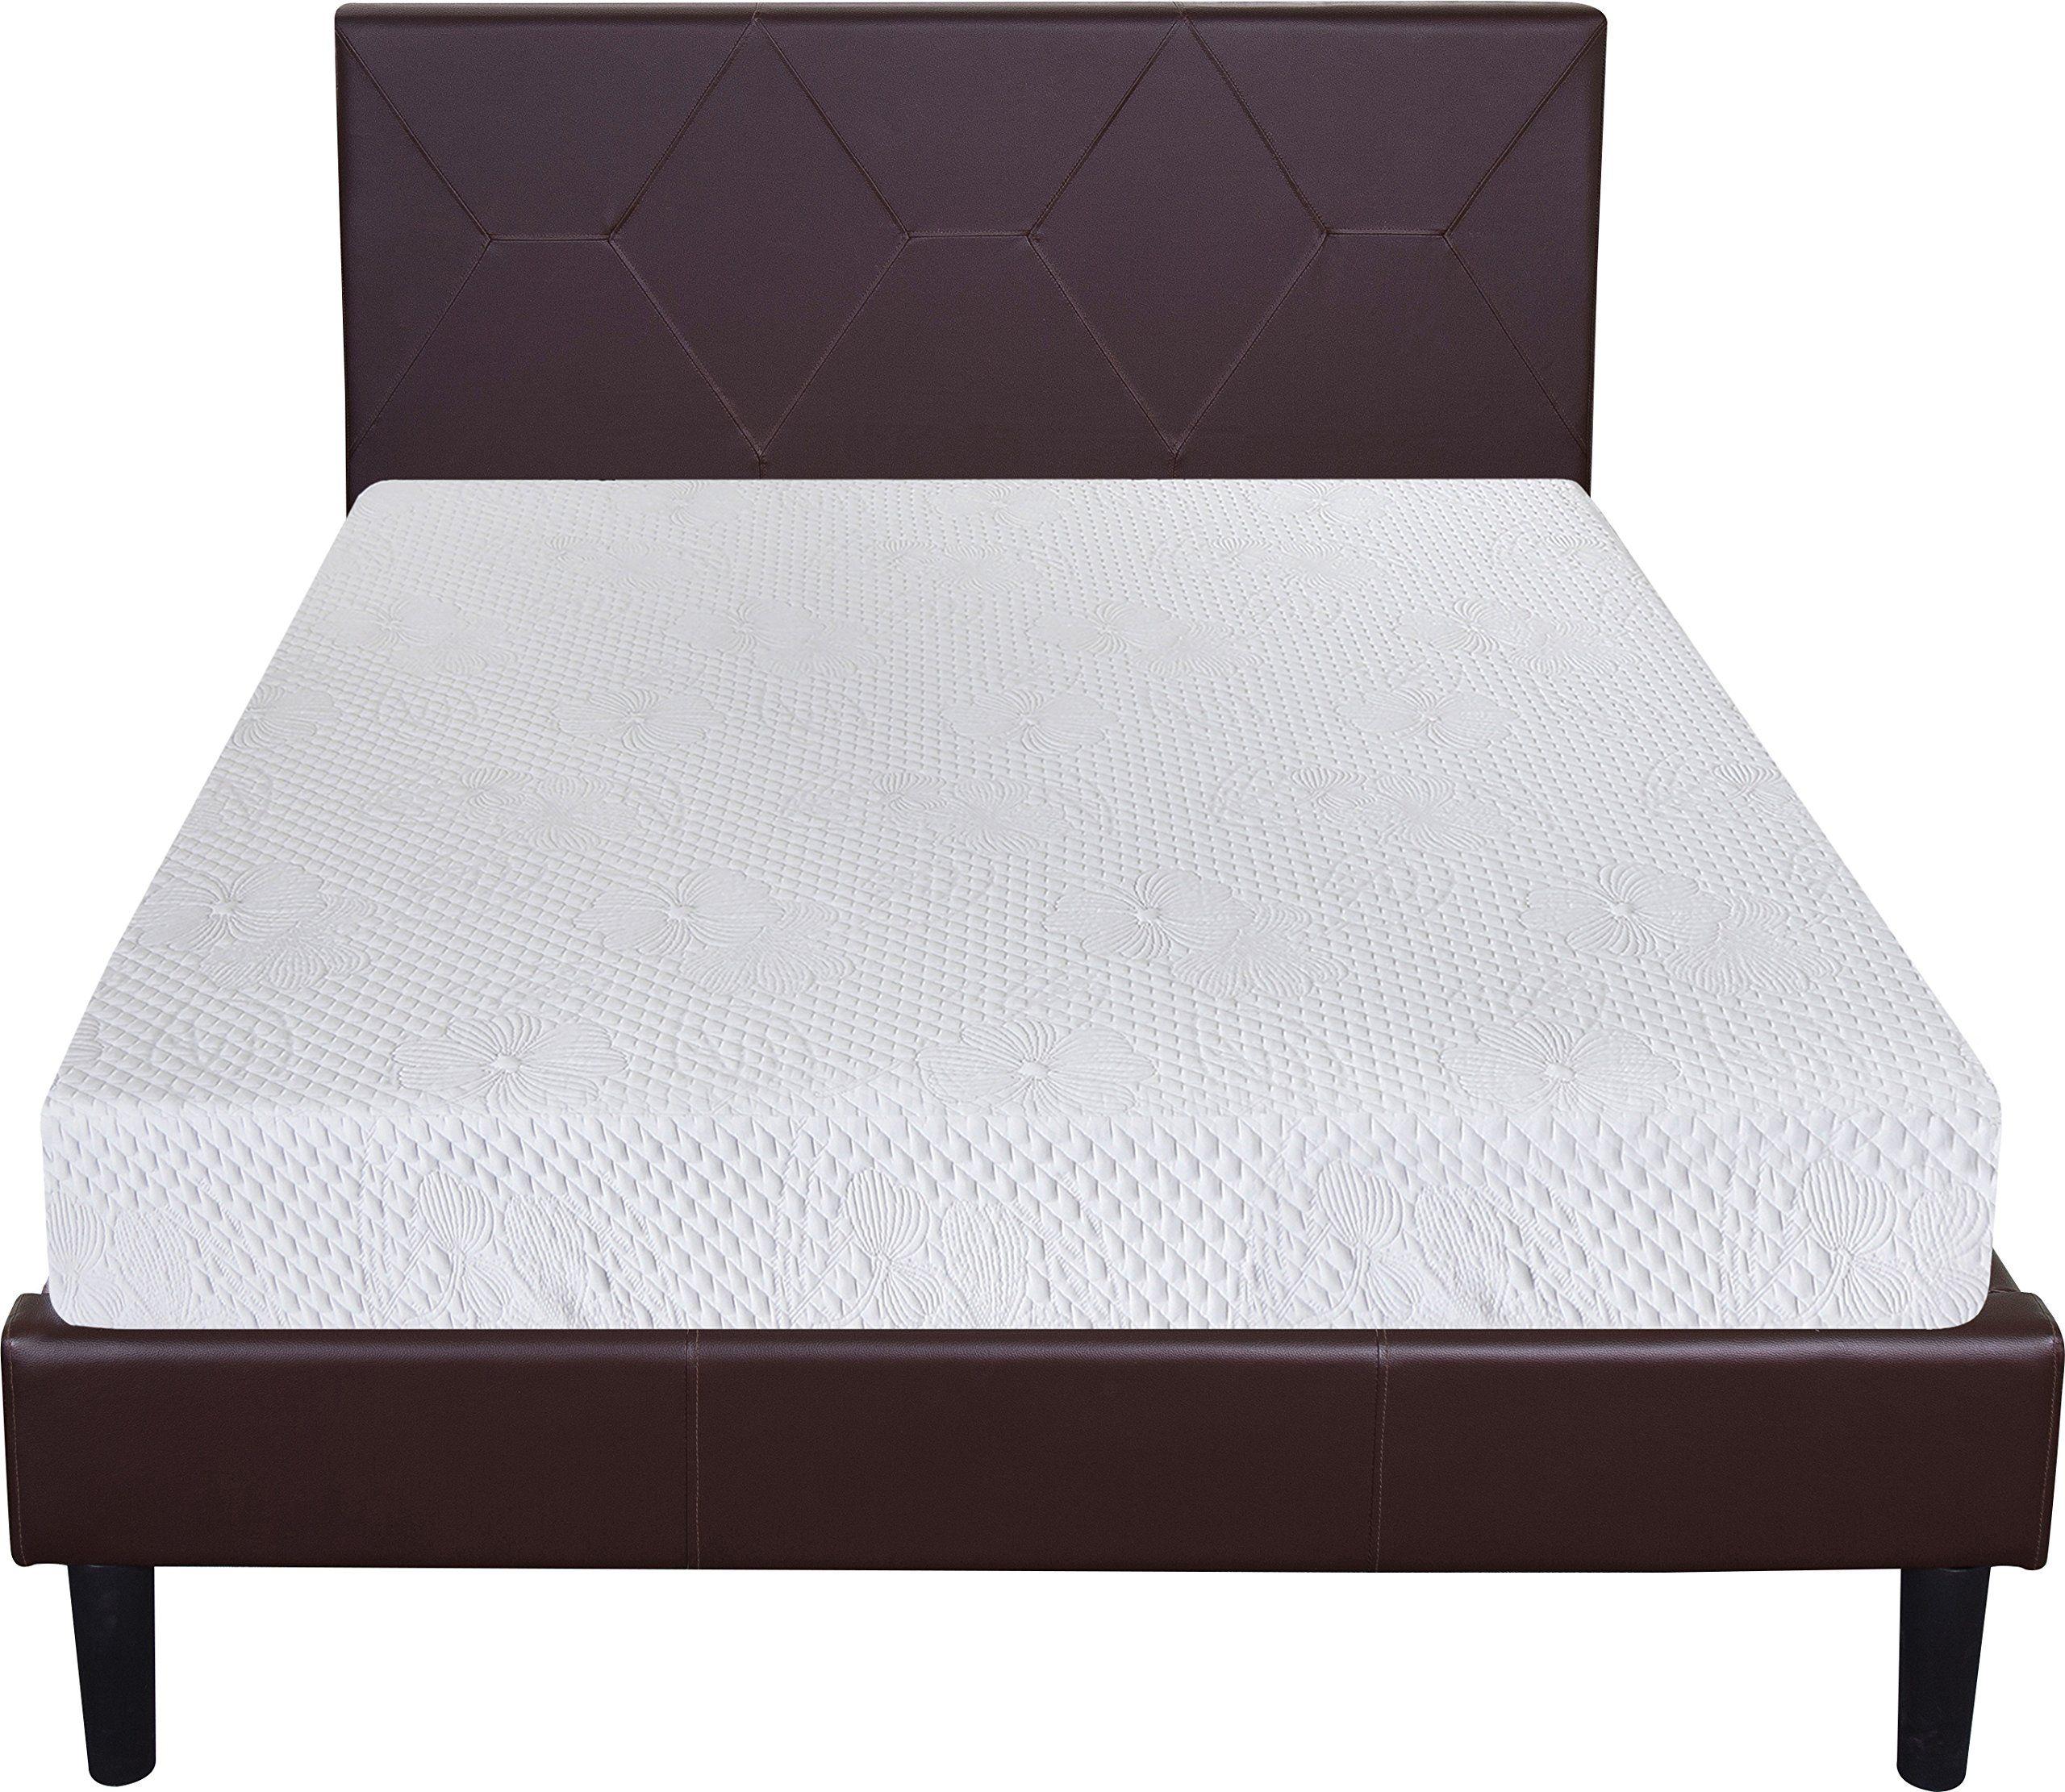 Olee Sleep 8 Inches Ventilated Convolution Memory Foam Mattress (Twin XL)